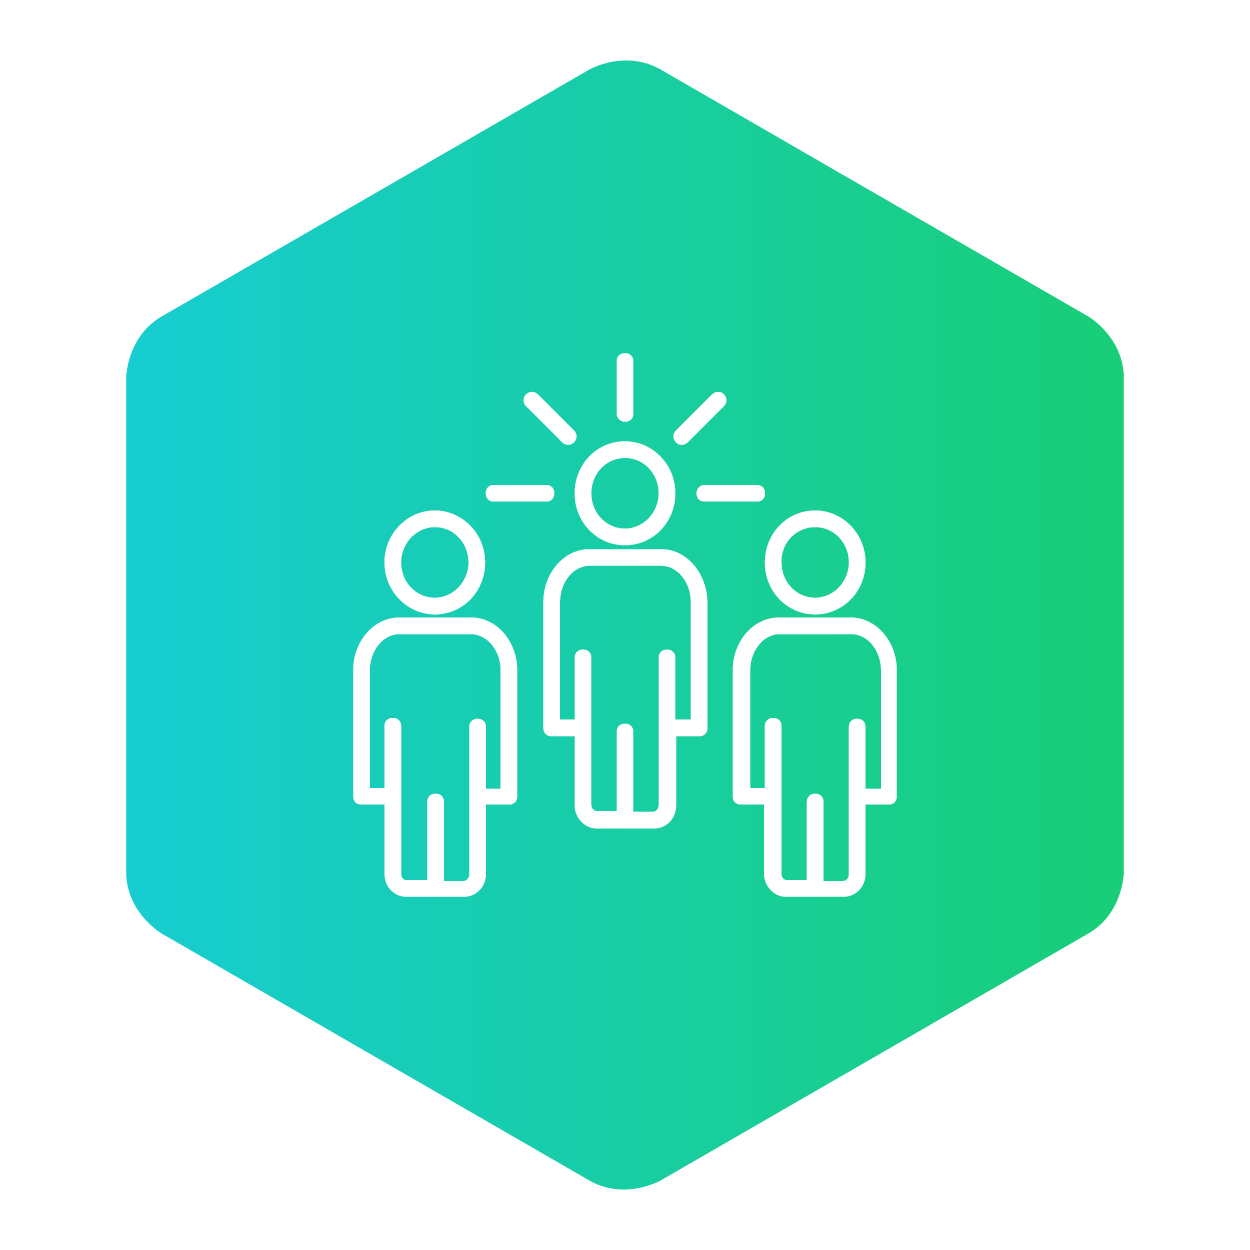 hexagon_leadership.png